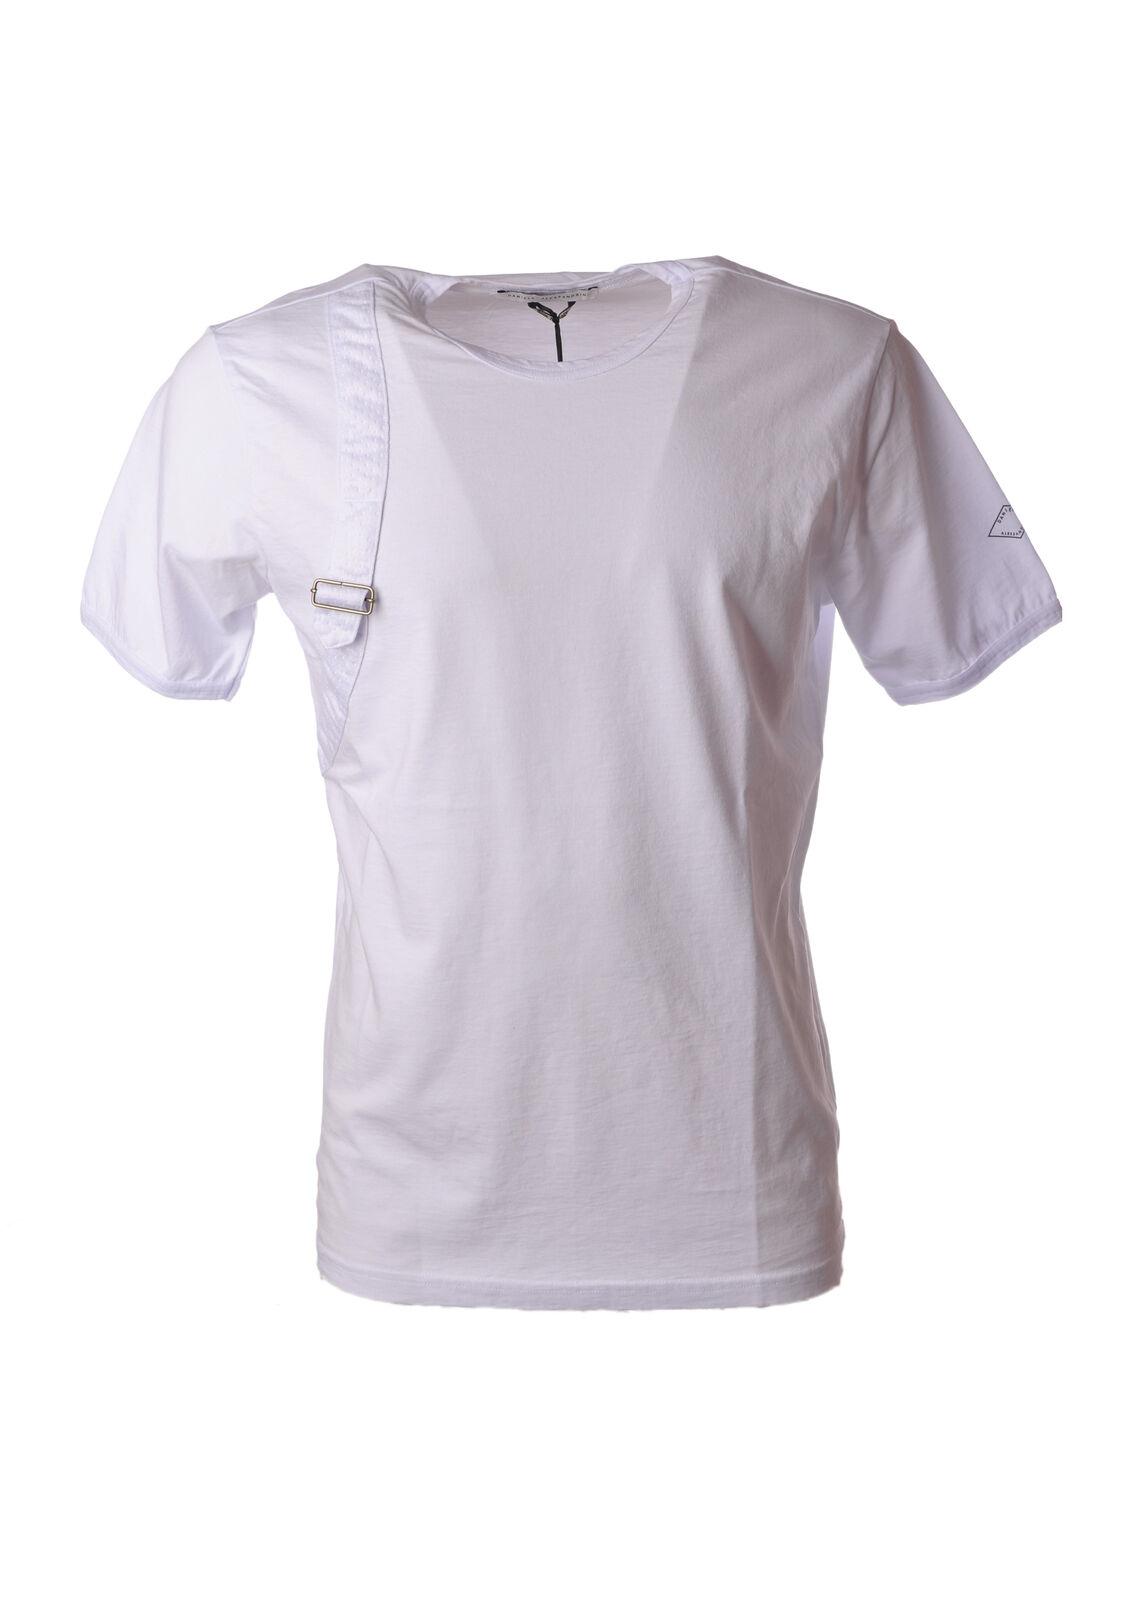 Daniele Alessandrini - Topwear-T-shirts - Man - Weiß - 5044809C181251